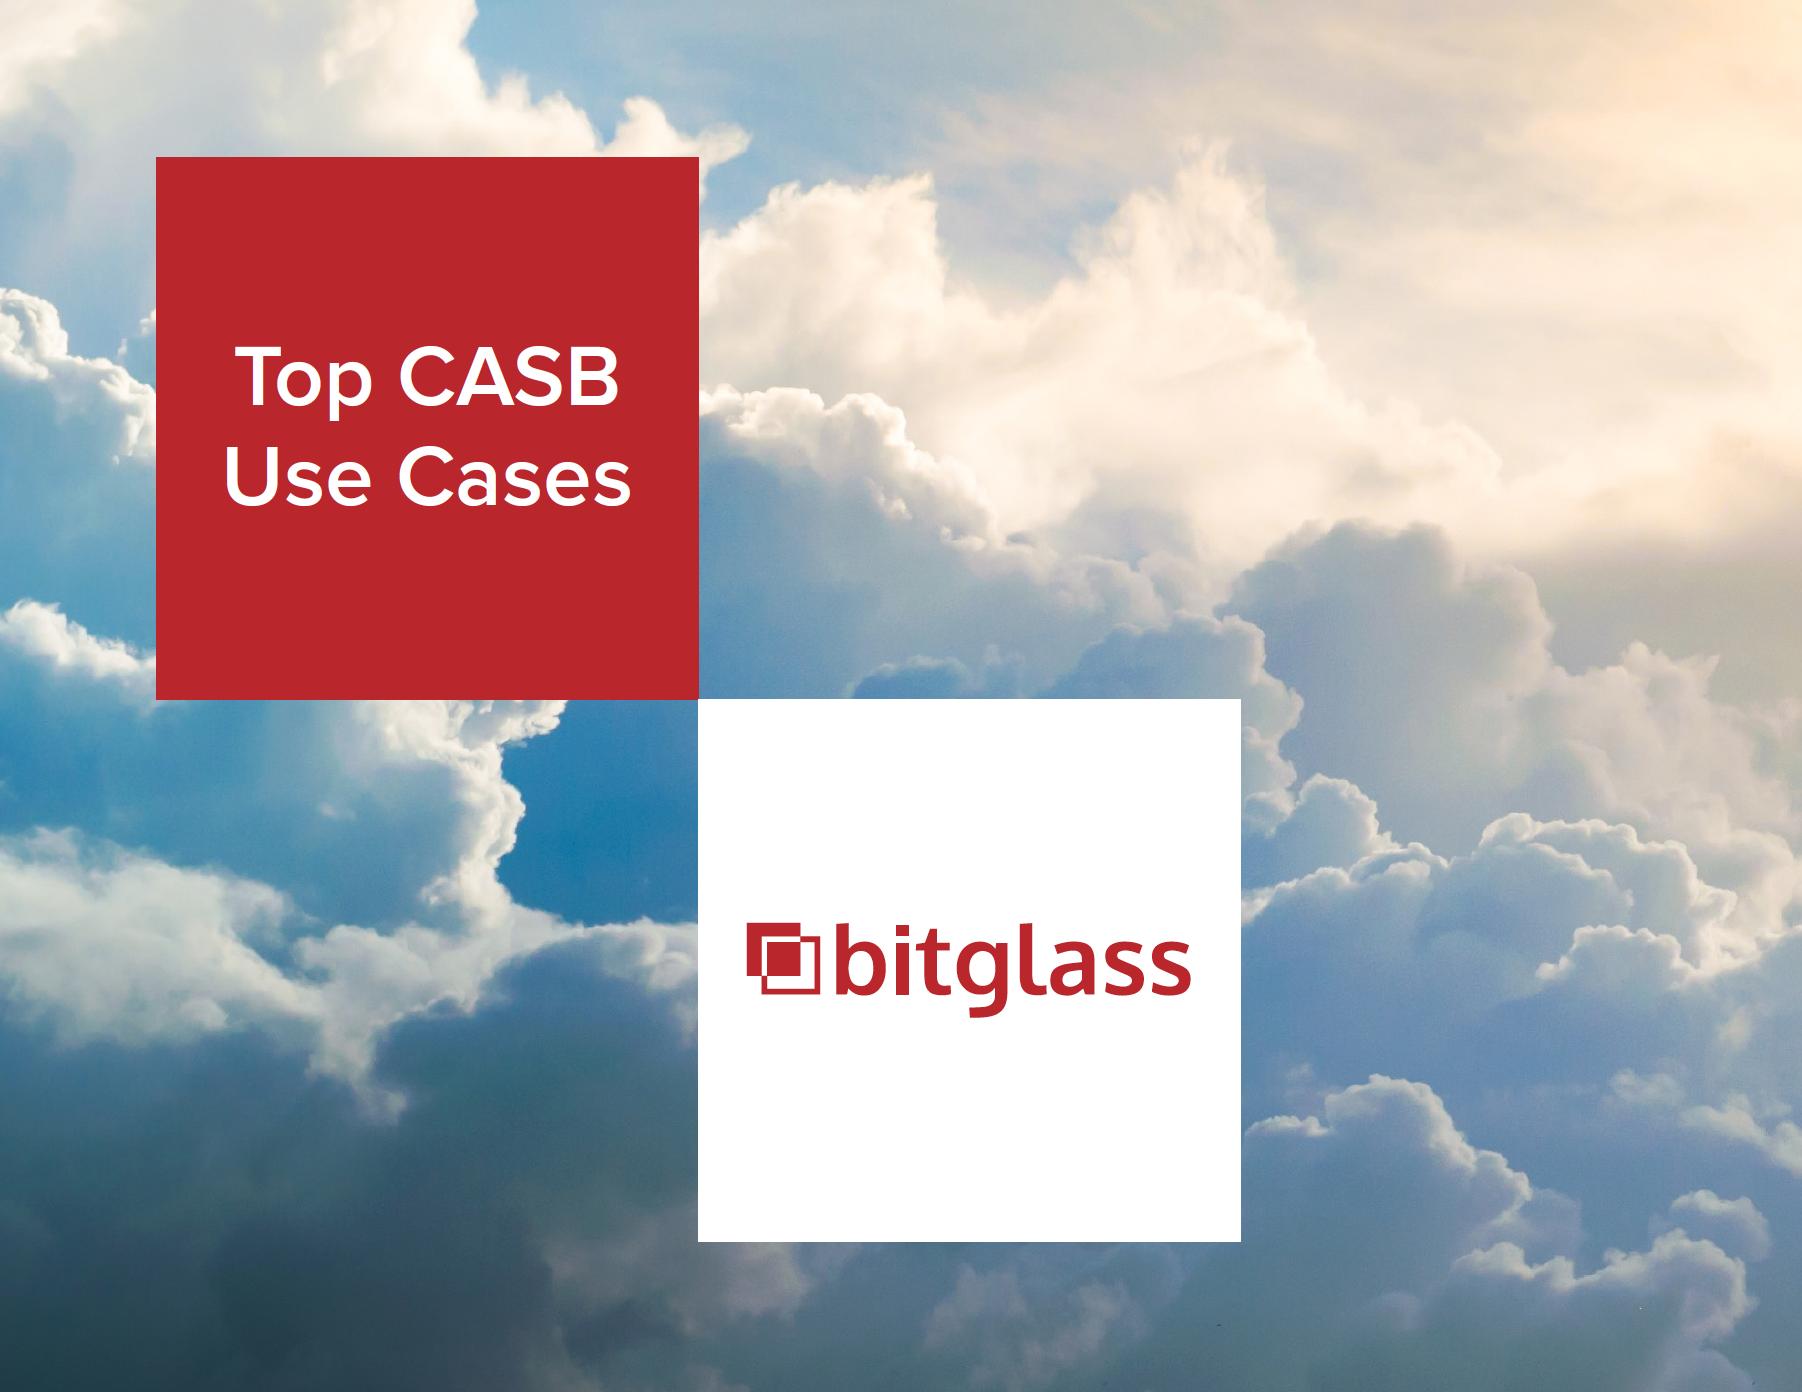 Siem Cloud Use Cases